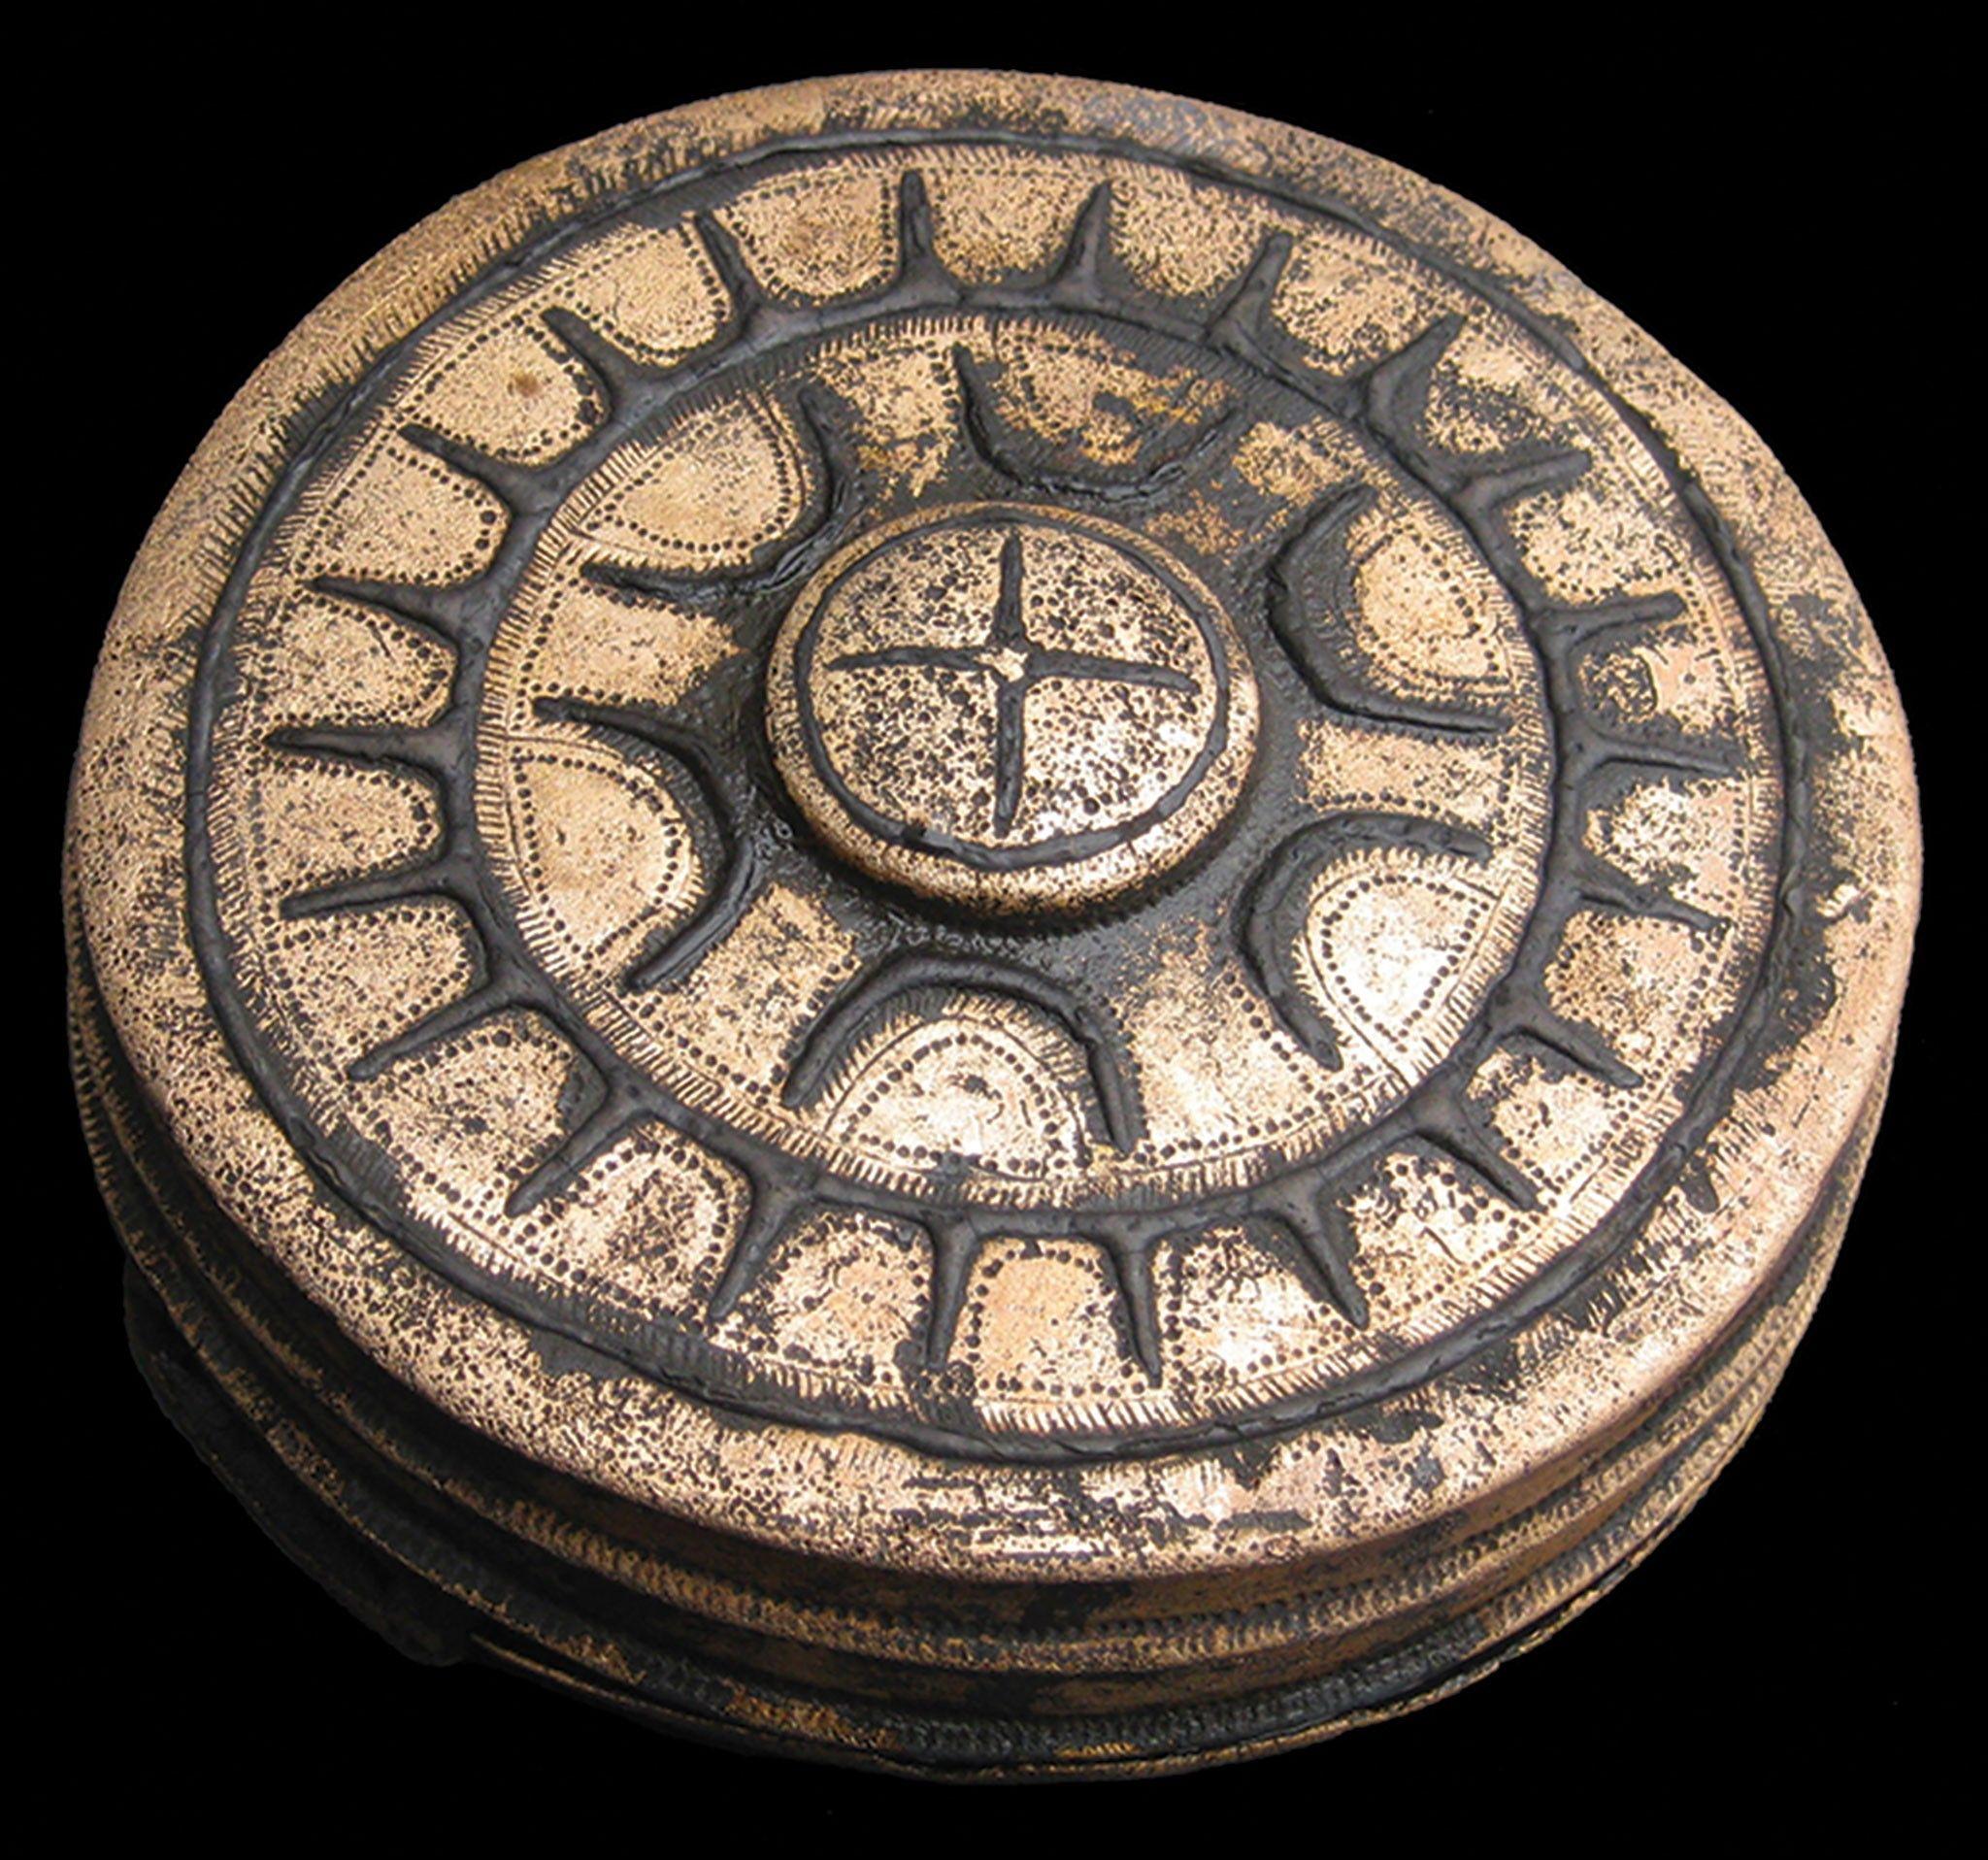 Rätselhafte Artefakte auf Europas ältestem Schlachtfeld entdeckt | National Geographic